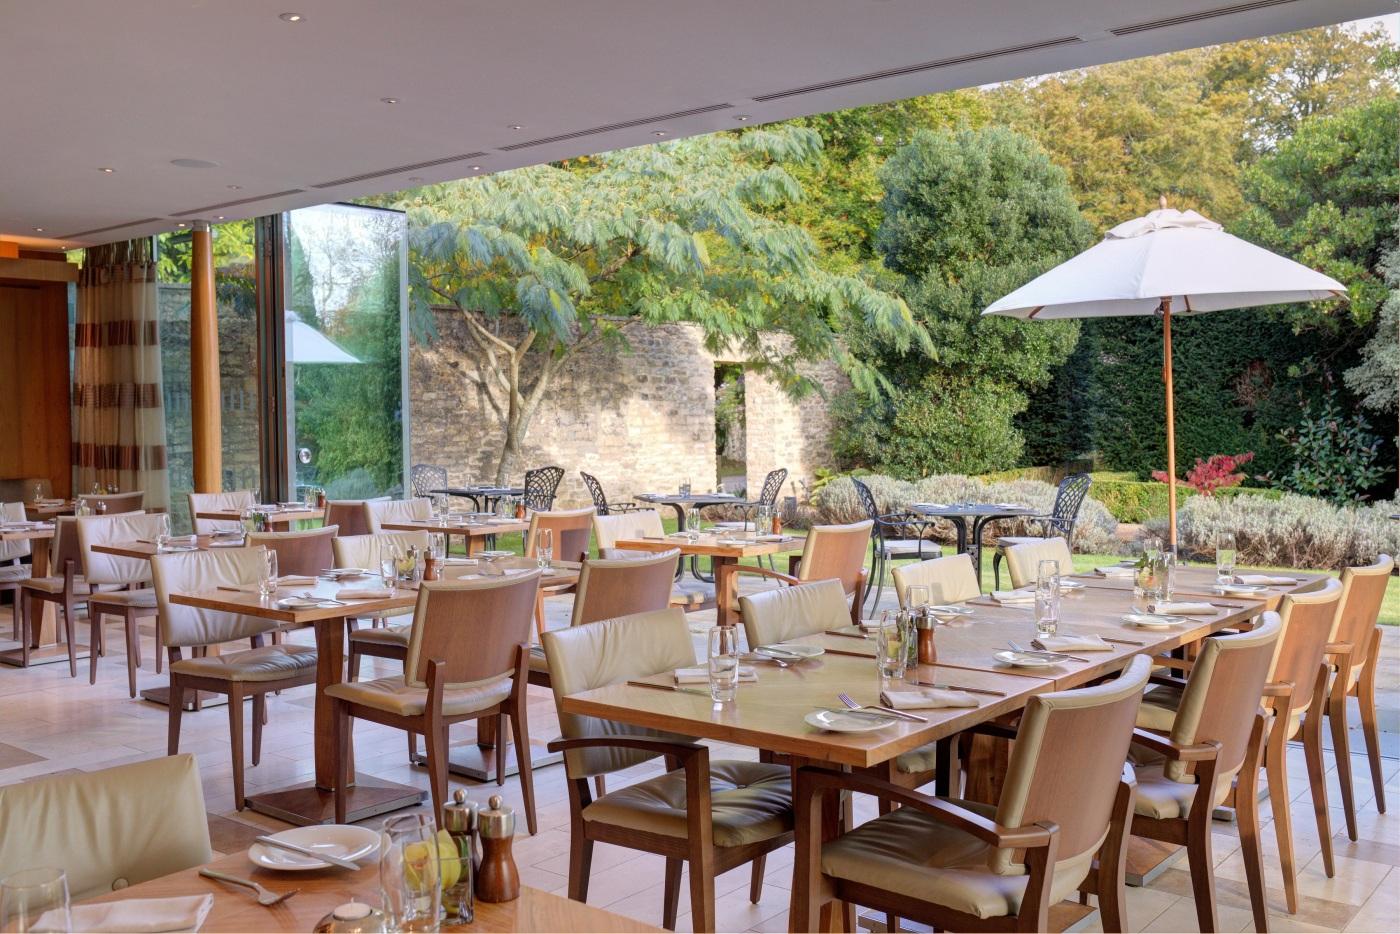 Brasserie image 1